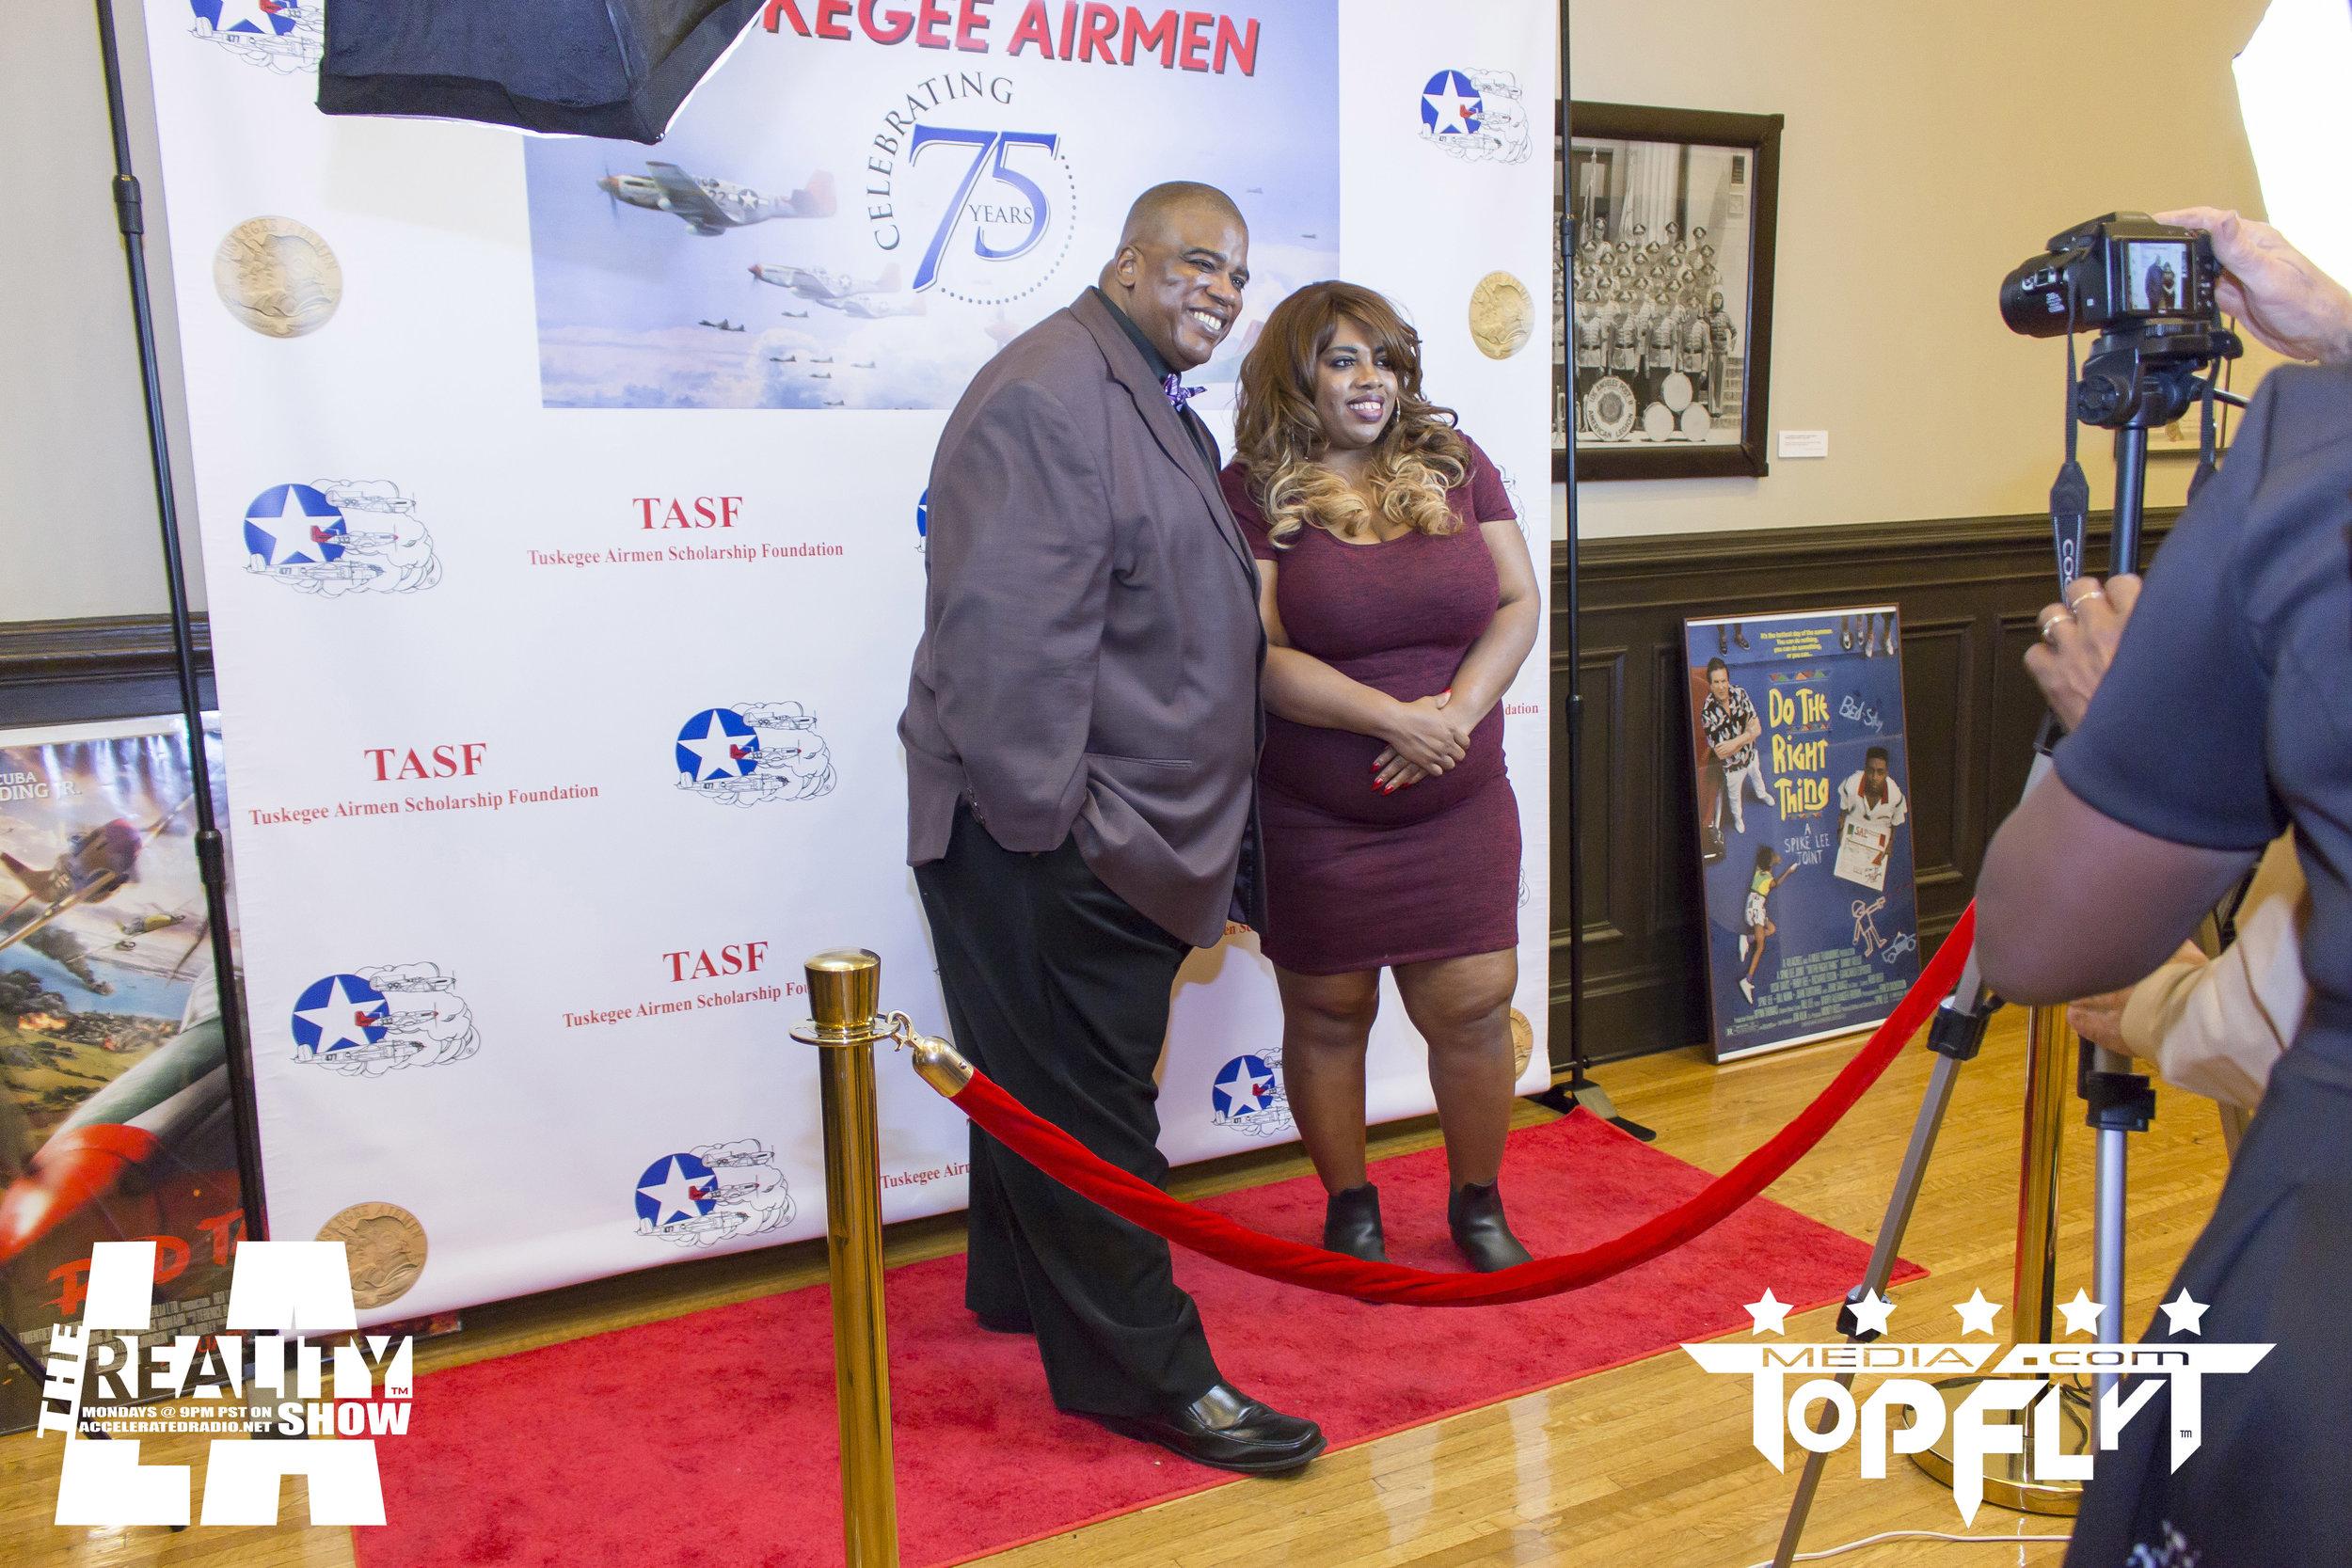 The Reality Show LA - Tuskegee Airmen 75th Anniversary VIP Reception_52.jpg